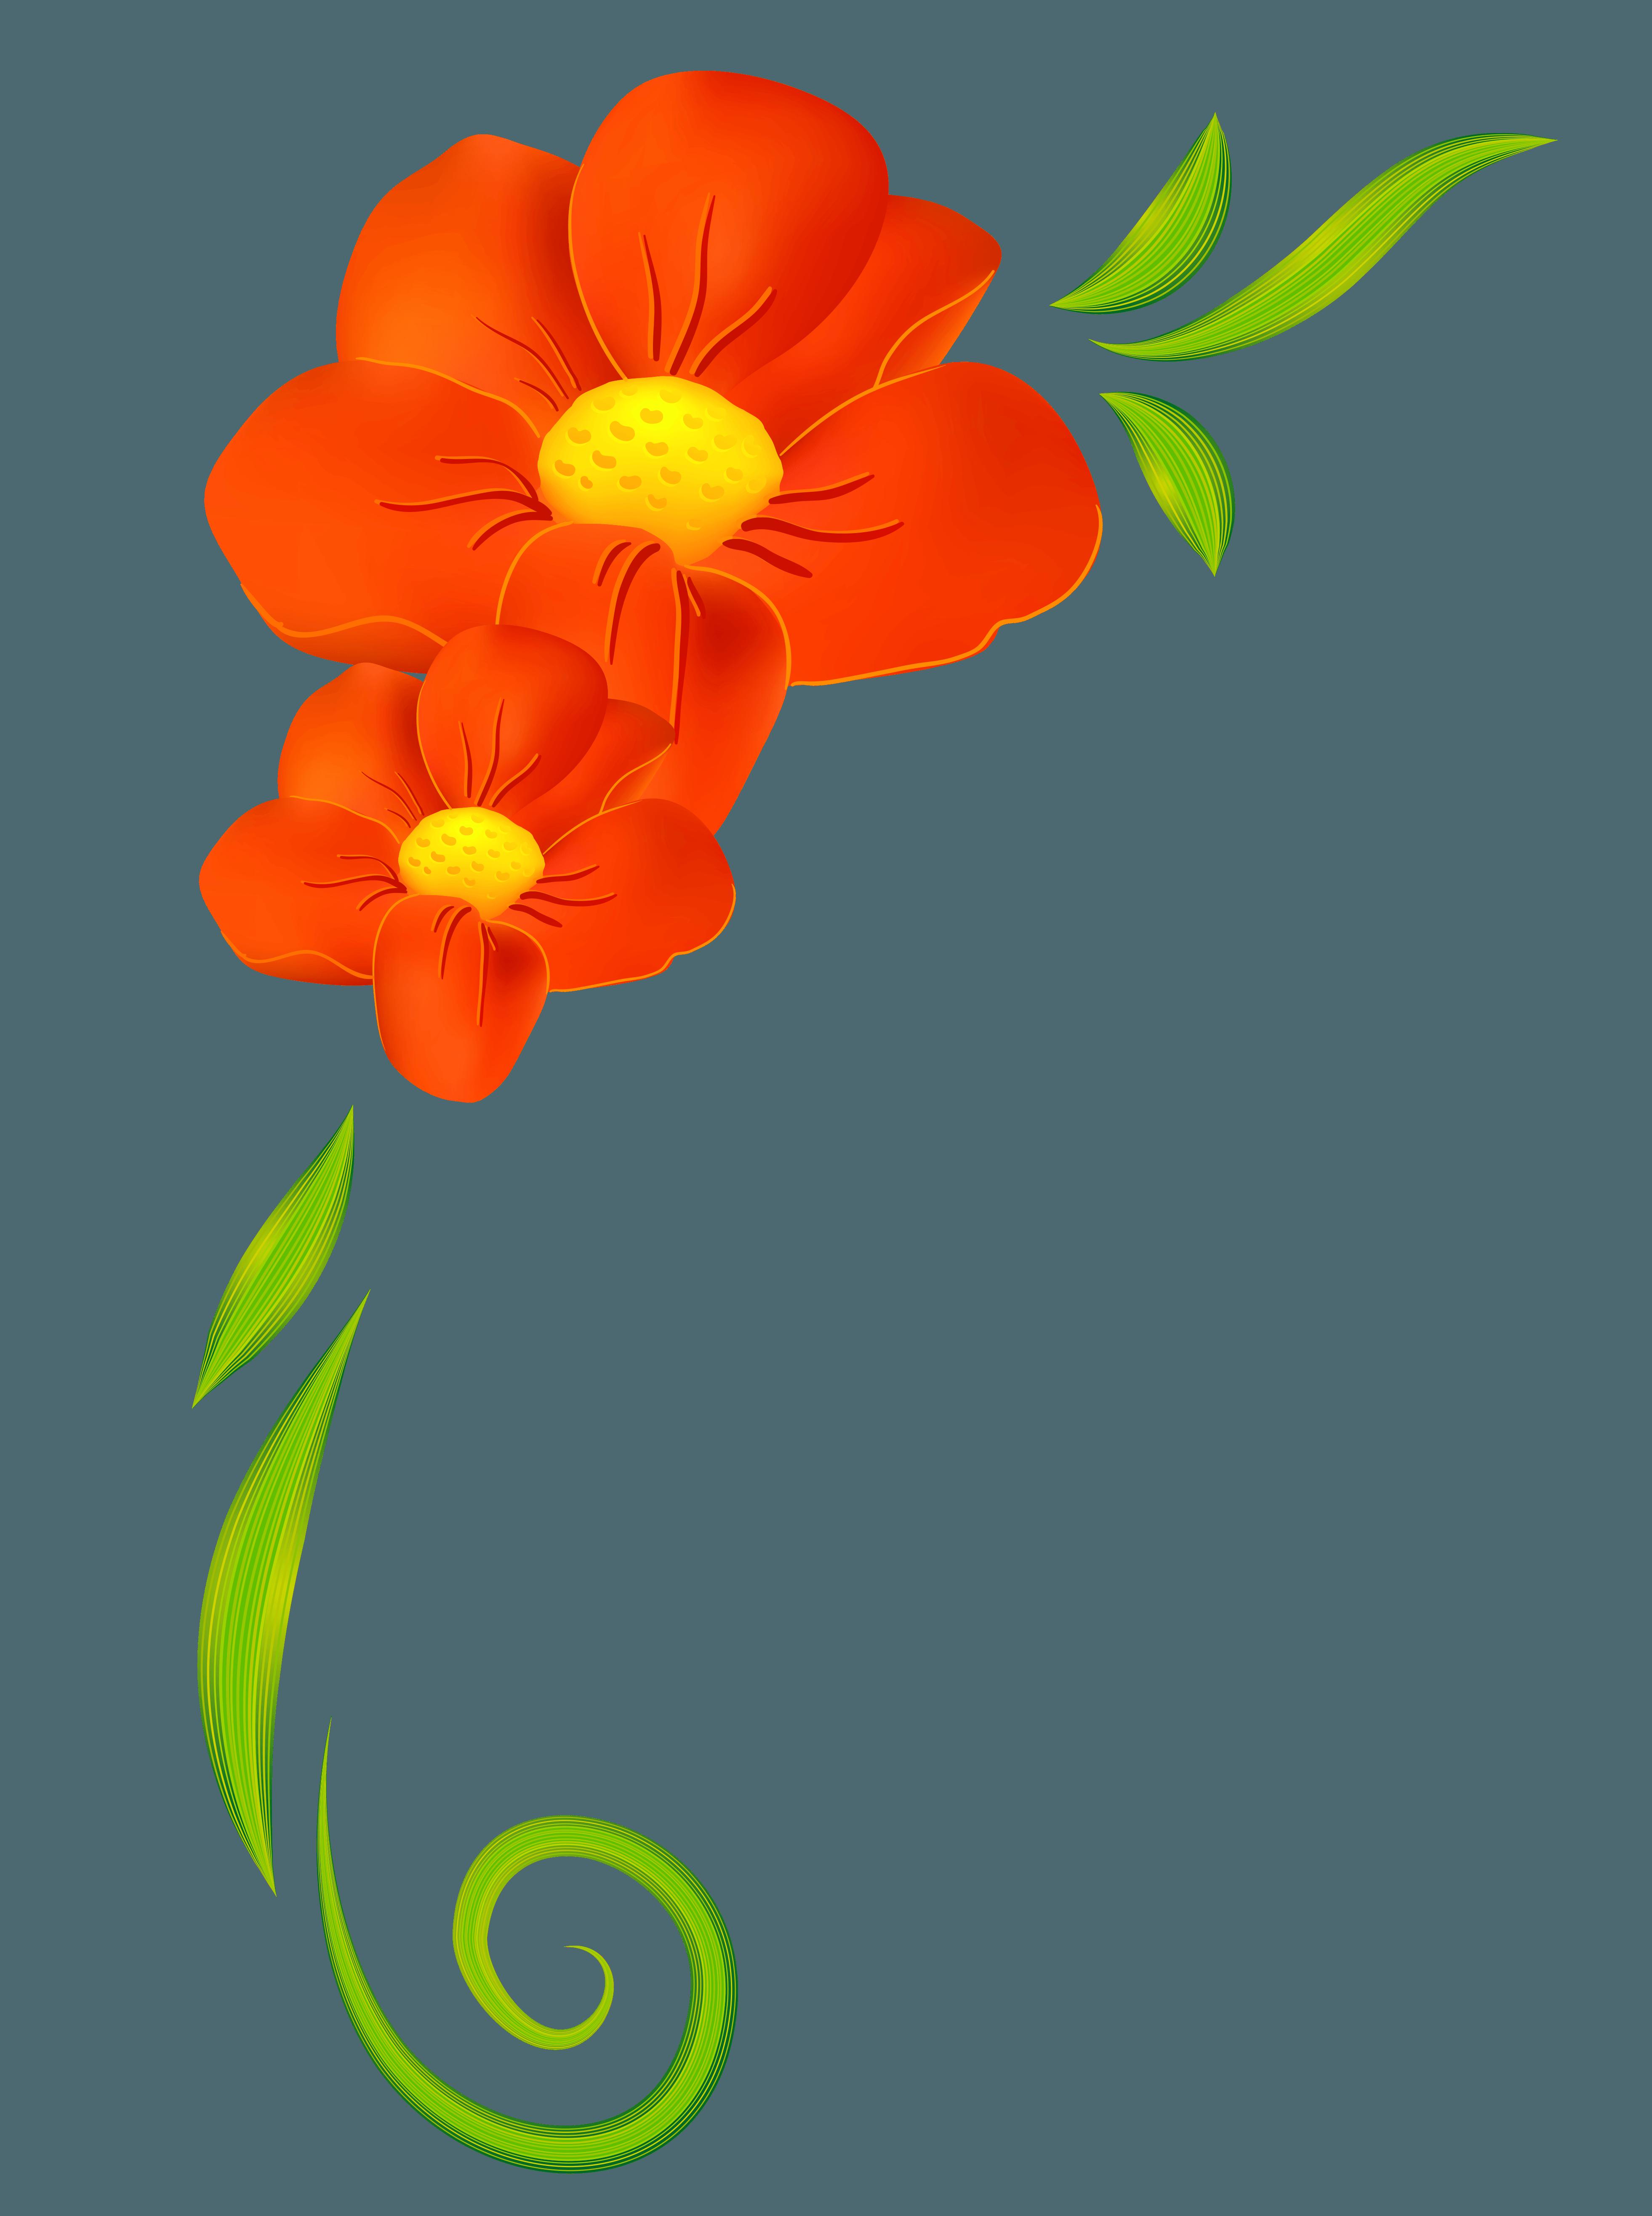 Orange Flower clipart small flower SouthTracks Images Orange Images Orange